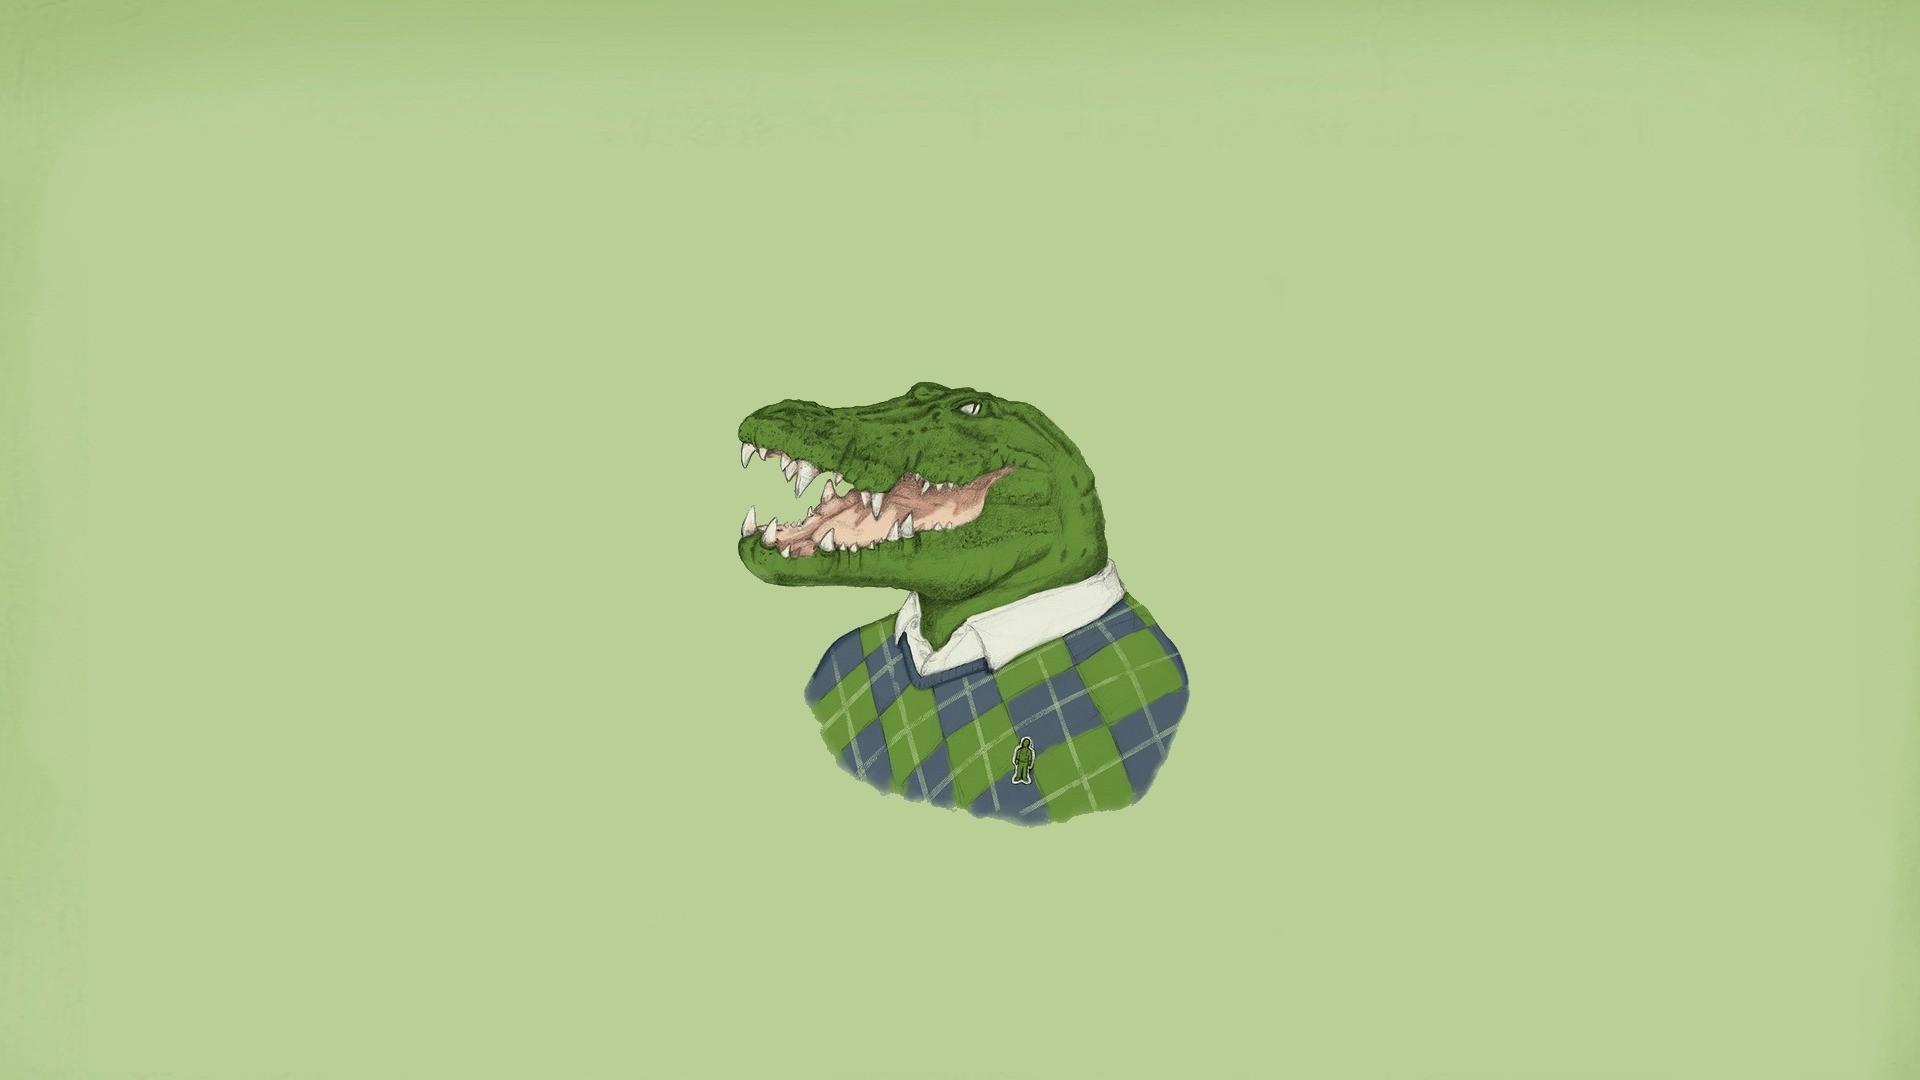 General 1920x1080 minimalism crocodile simple background